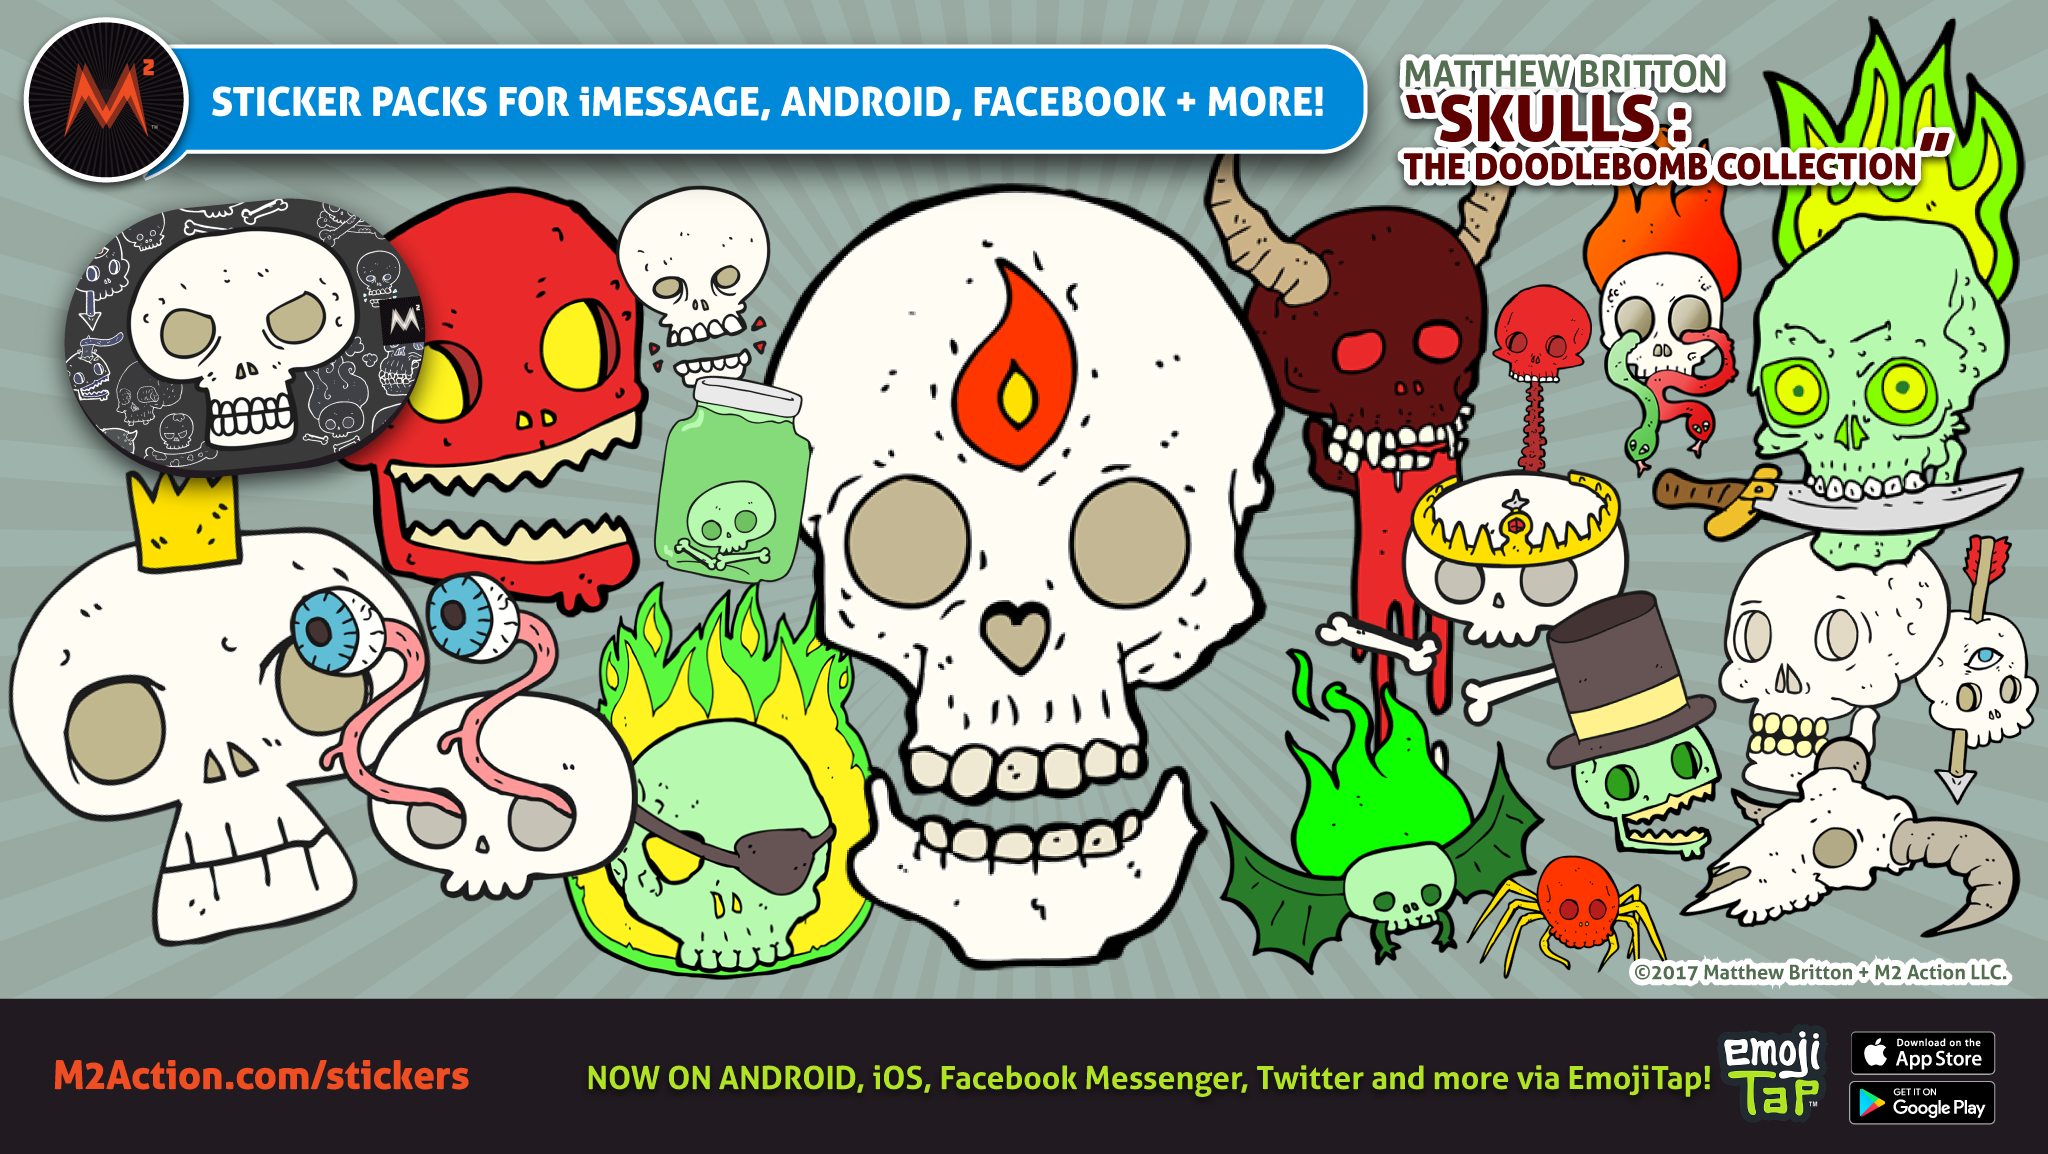 M2_Stickers_Promos_April2017_MatthewBritton_SkullsDoodleBomb.png